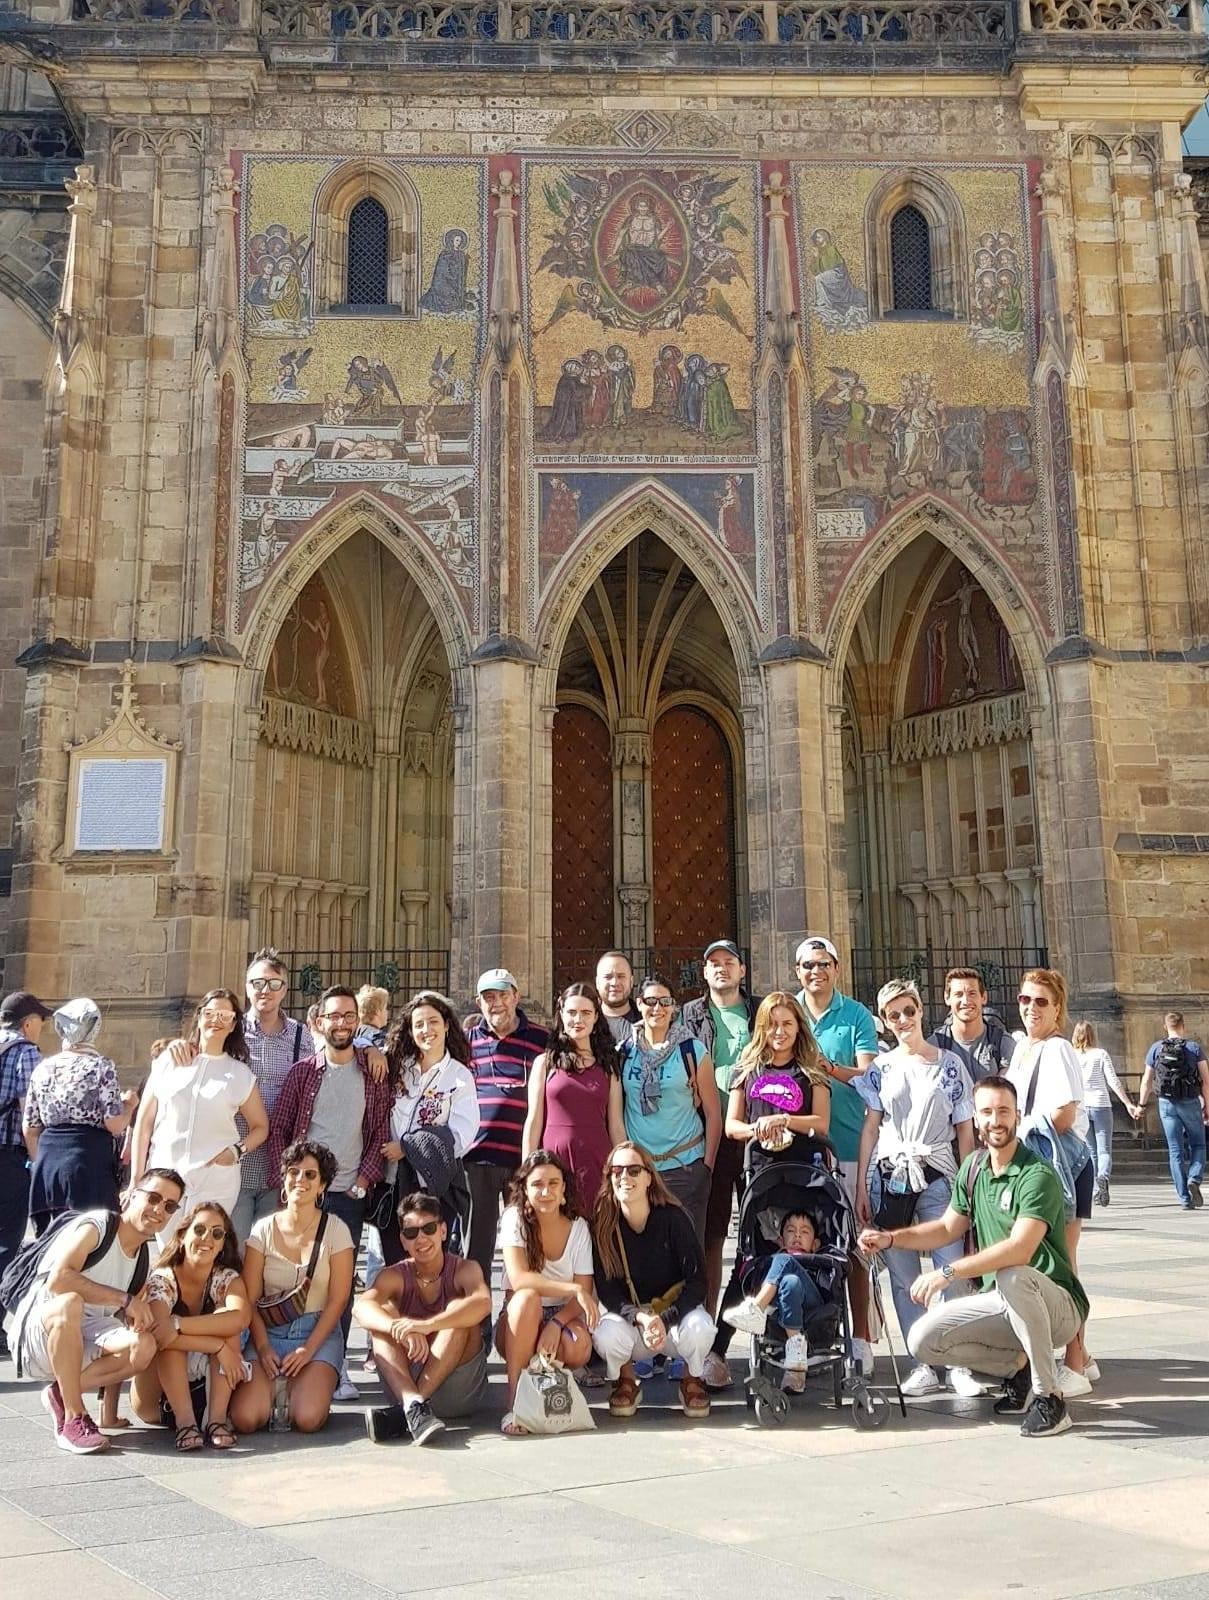 prague-castle-and-mala-strana-district-tour-13